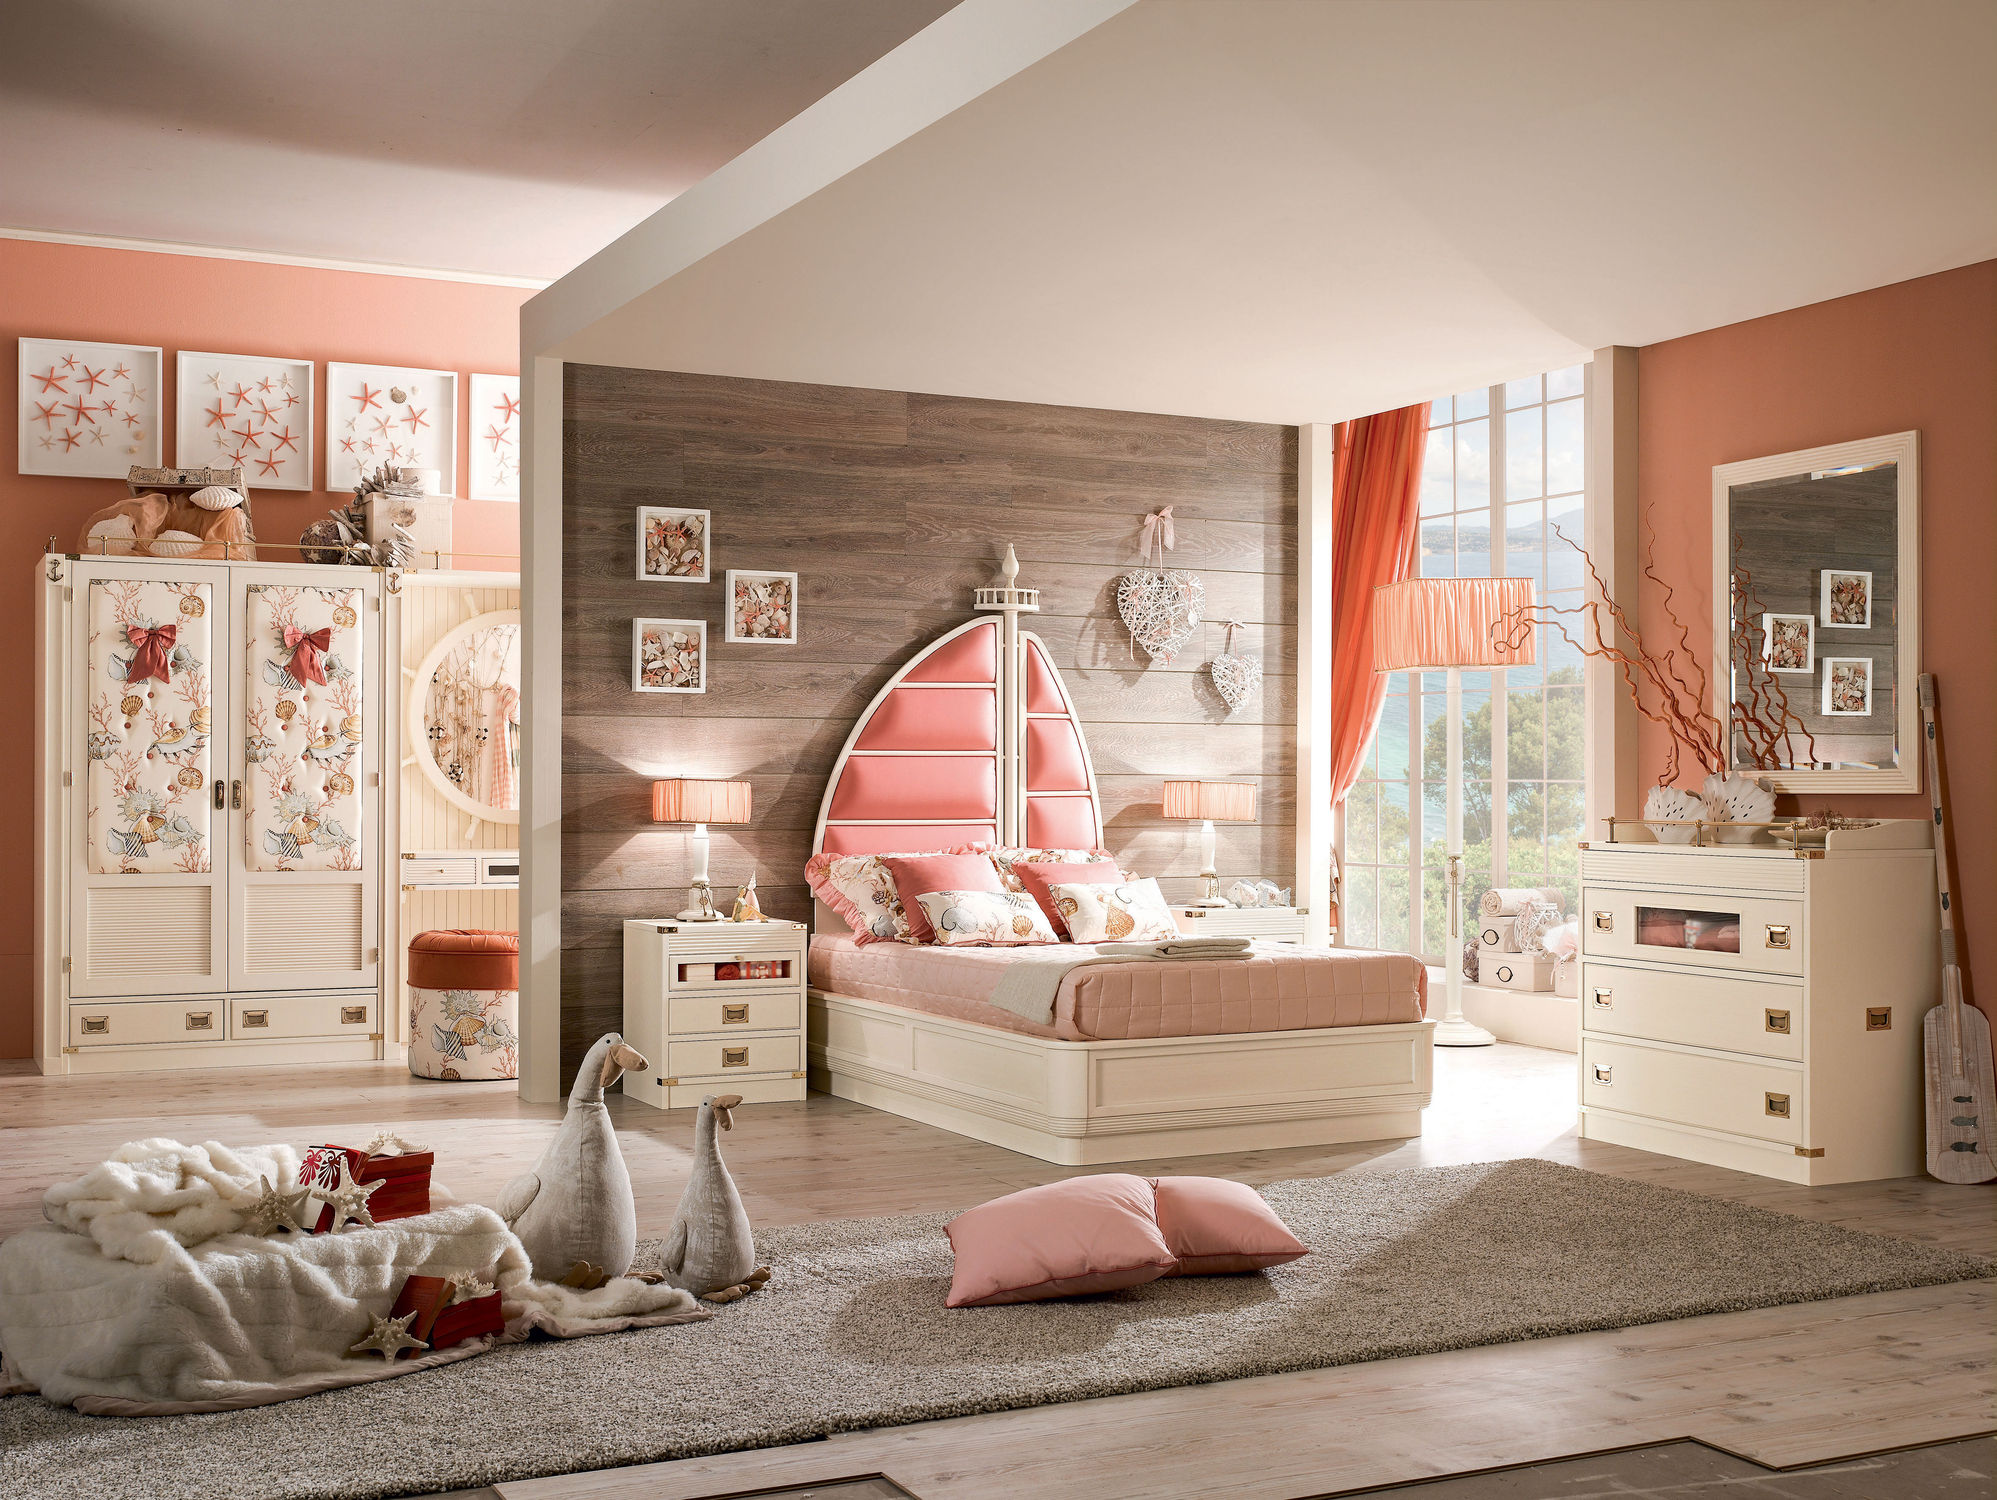 Quality Childrens Bedroom Furniture Girls Childrens Bedroom Furniture Set White 215 Ariel Caroti